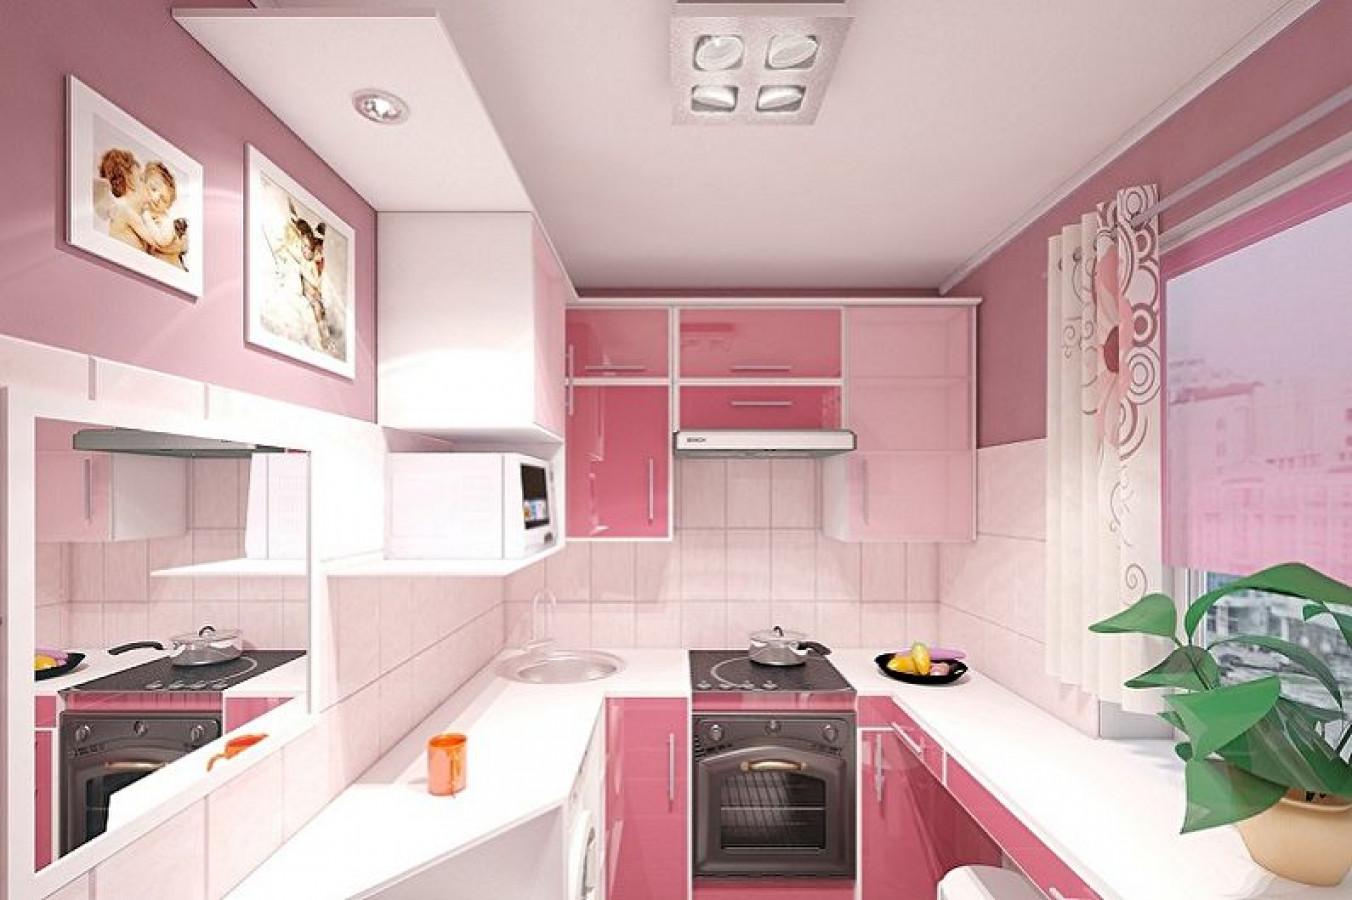 Кухня на зказ  Имидж фотография